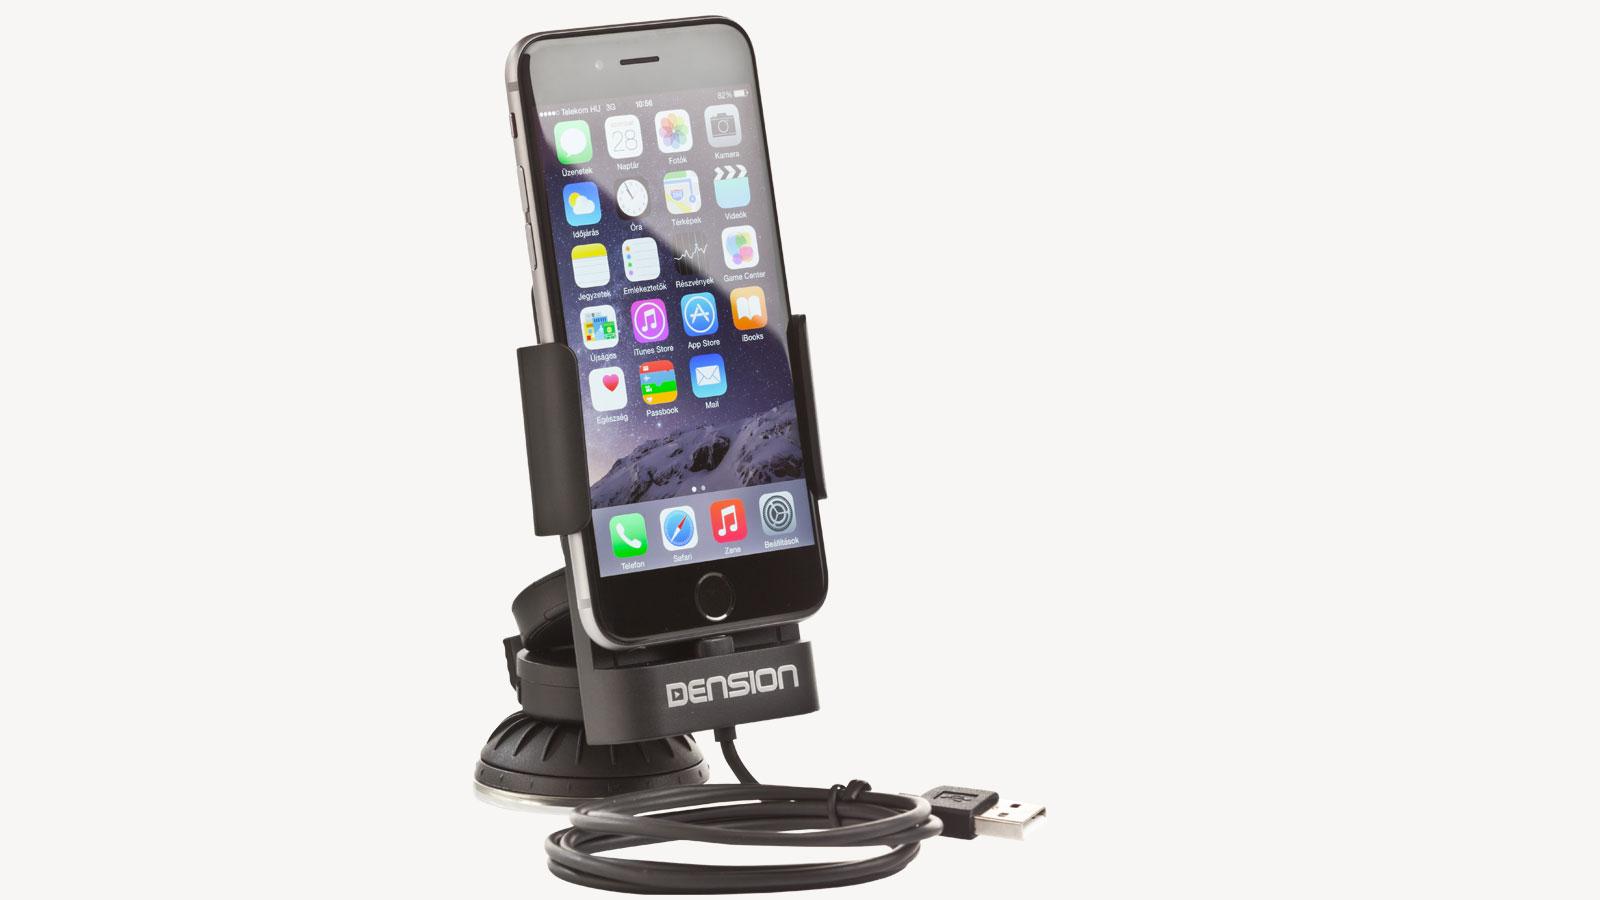 Aktívny držiak pre iPhone 6/6 Plus, iPhone 5